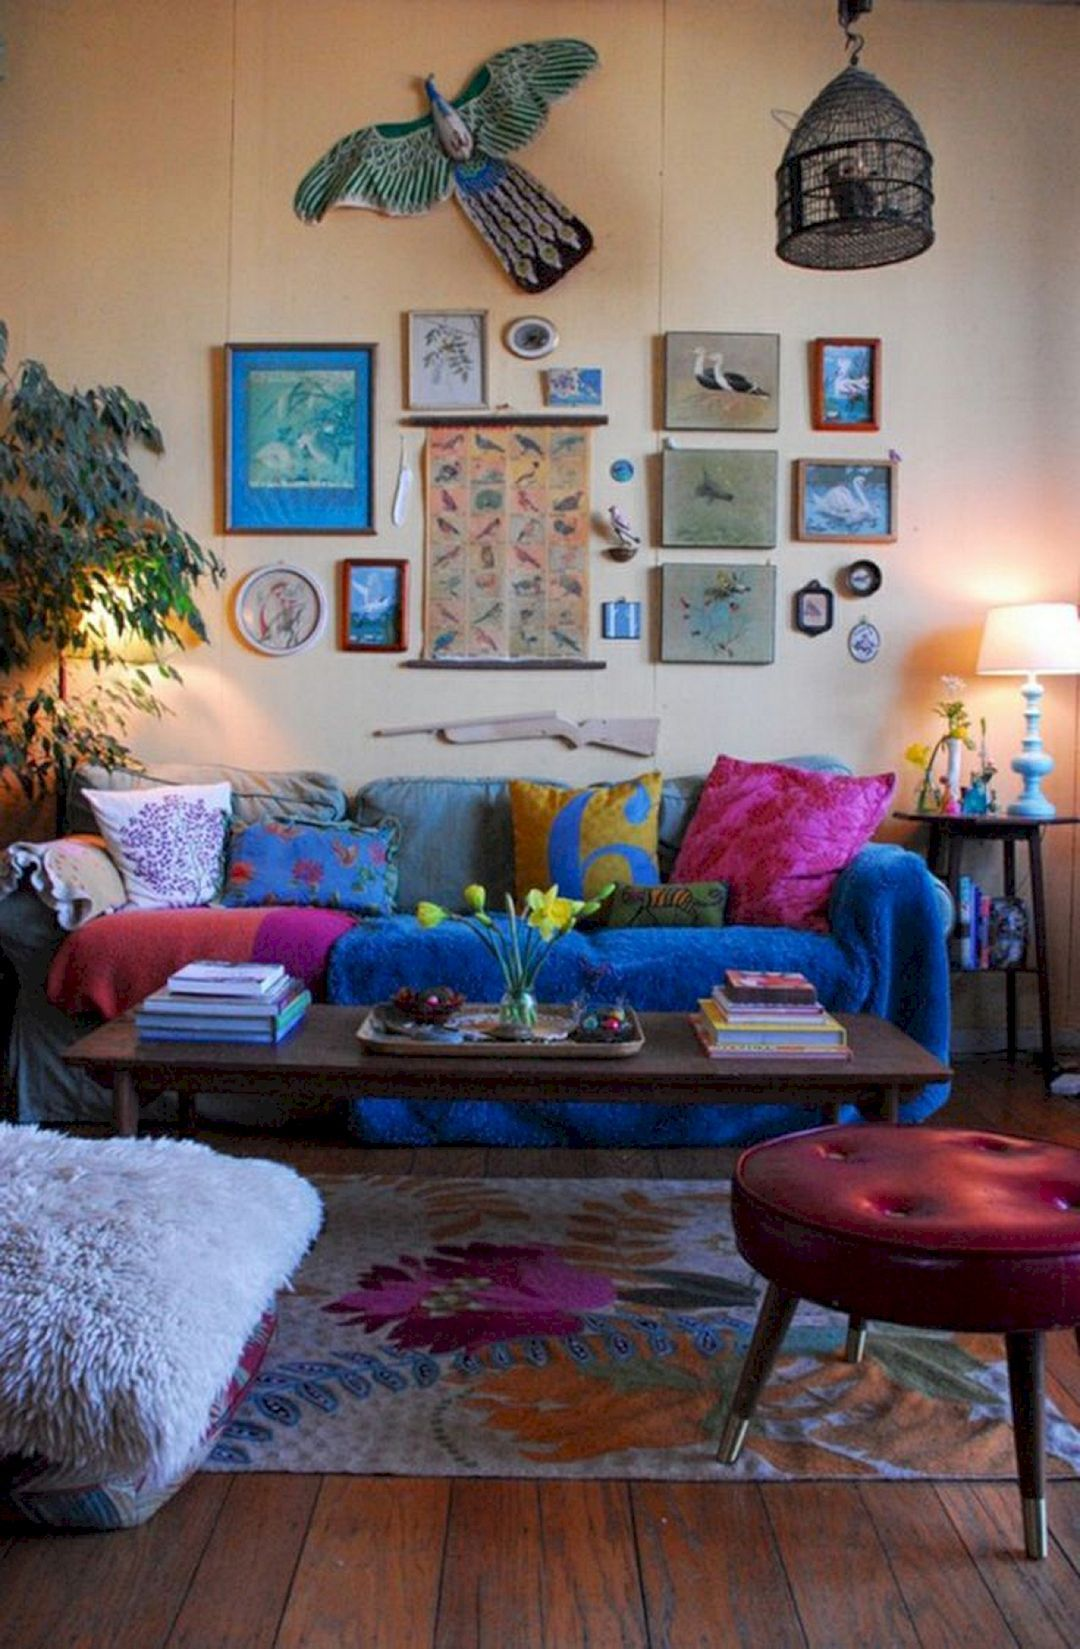 40 stylist boho chic home and apartment decor ideas s p a c e